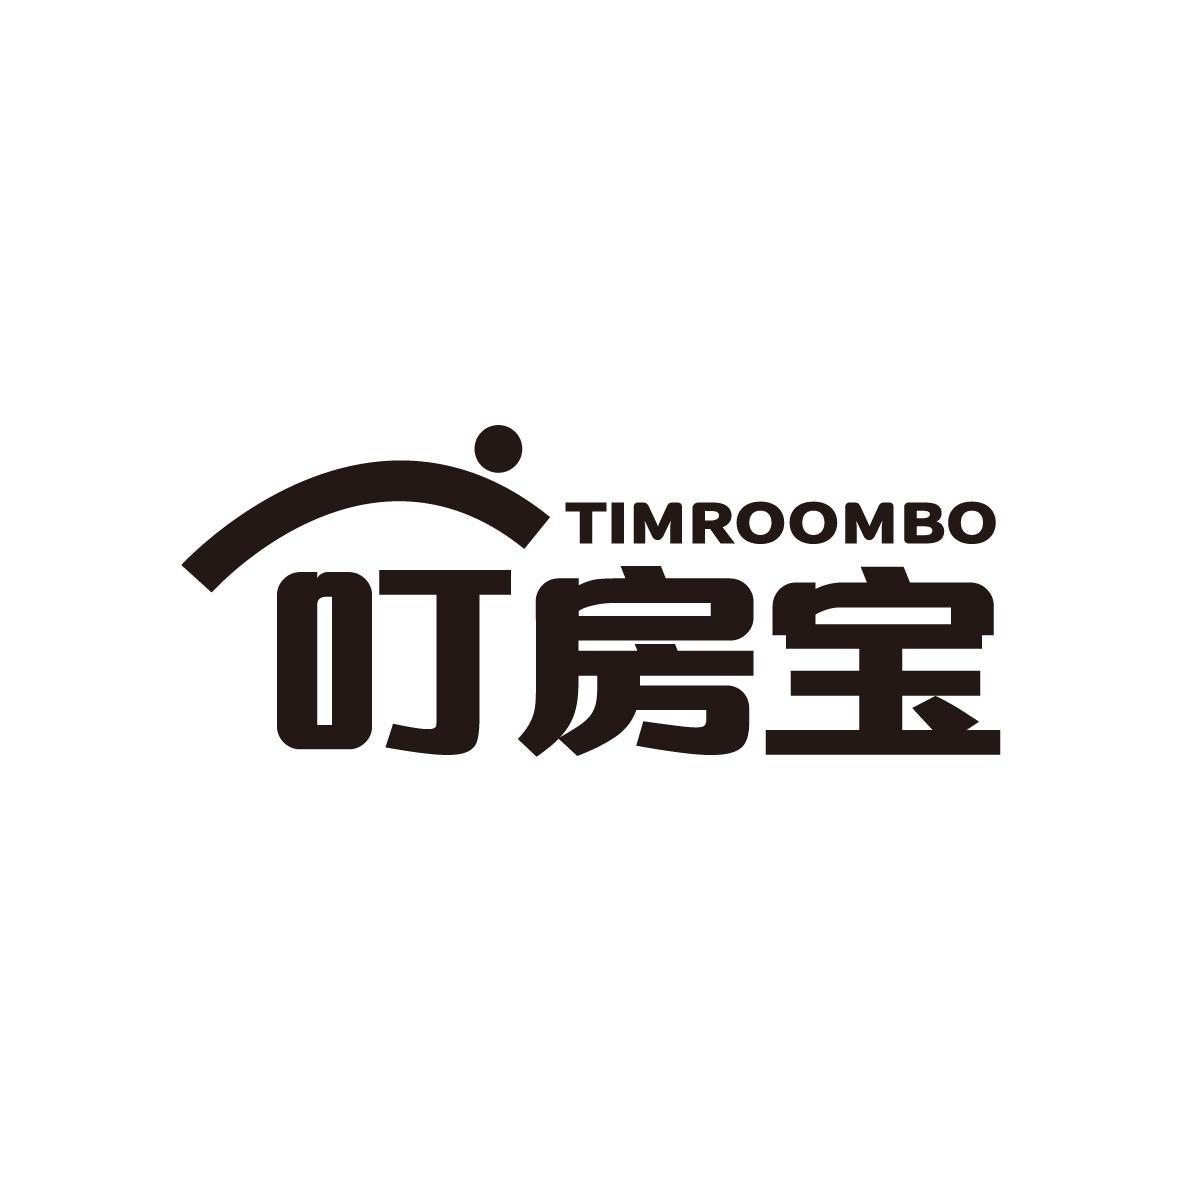 转让商标-叮房宝 TIMROOMBO